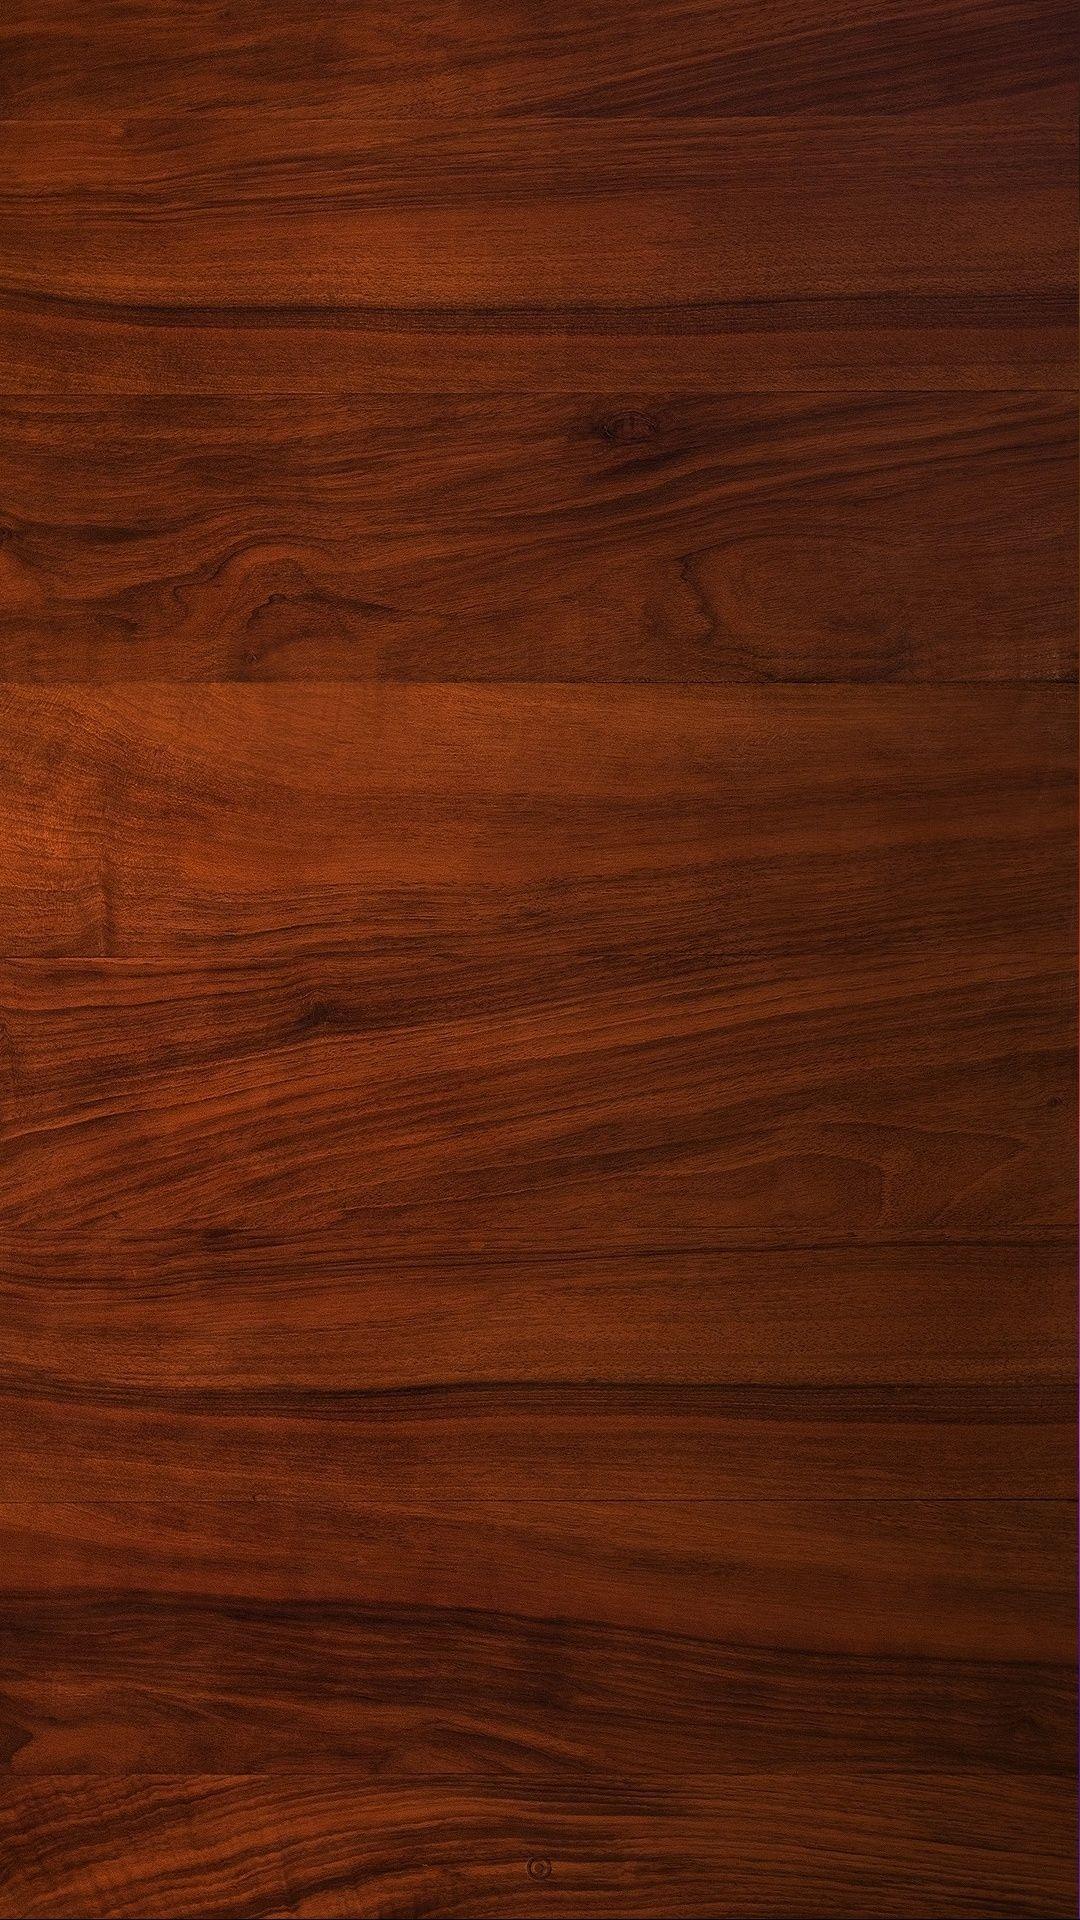 Dark Wood Desktop Wallpaper Wood Wallpapers Desktop Phone 1080x1920